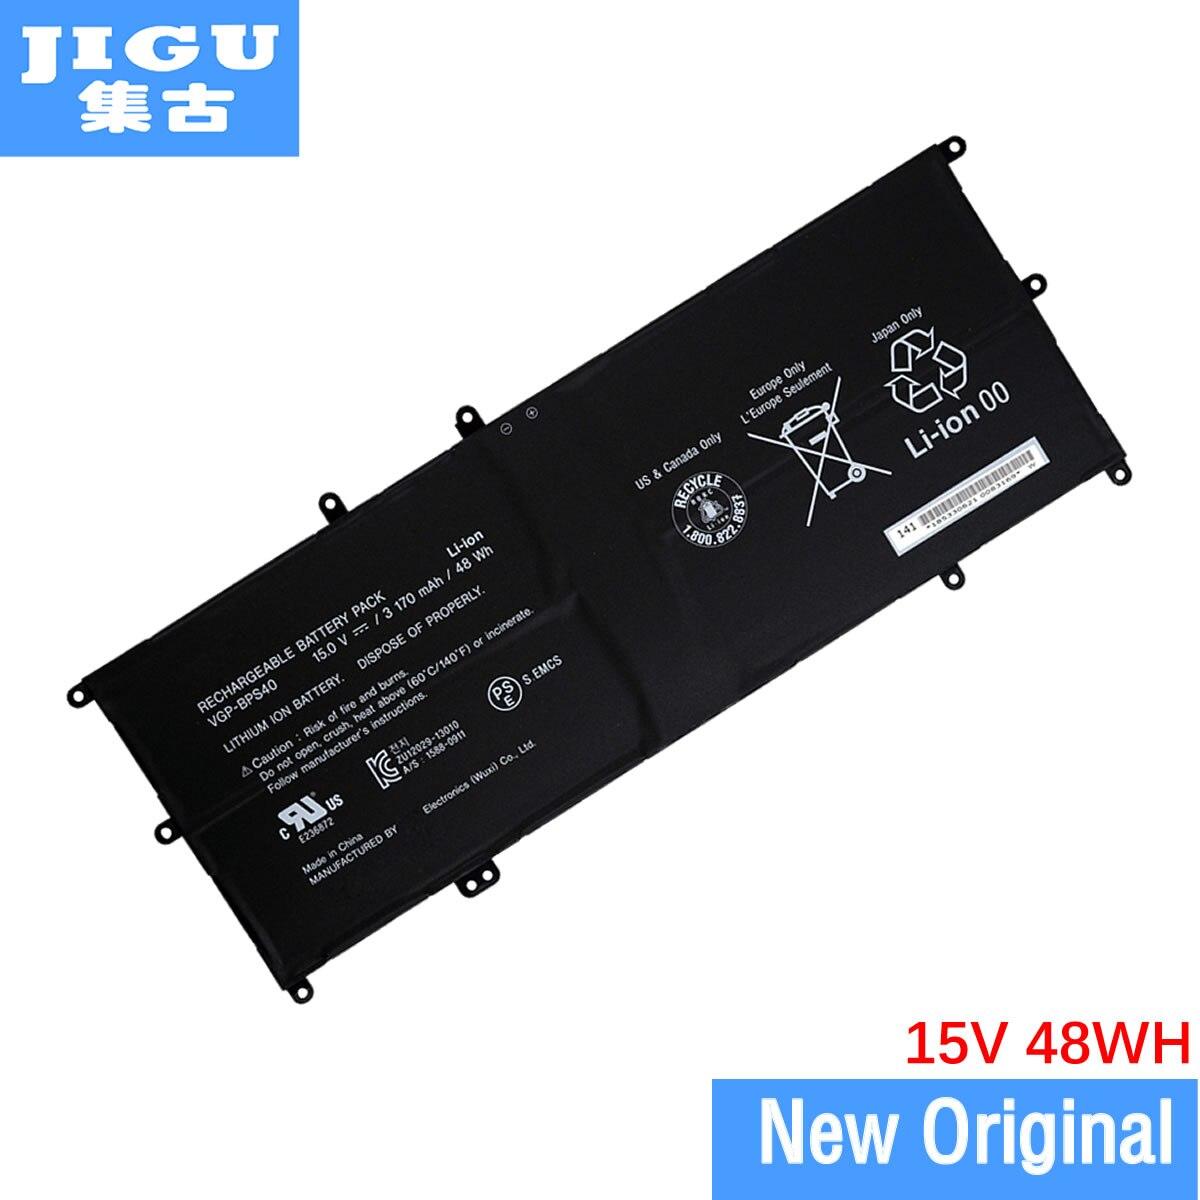 JIGU VGP-BPS40 orijinal Laptop batarya SONY VAIO Fit için 14A 15A SVF14N SVF15N serisi 15V 3170MAH